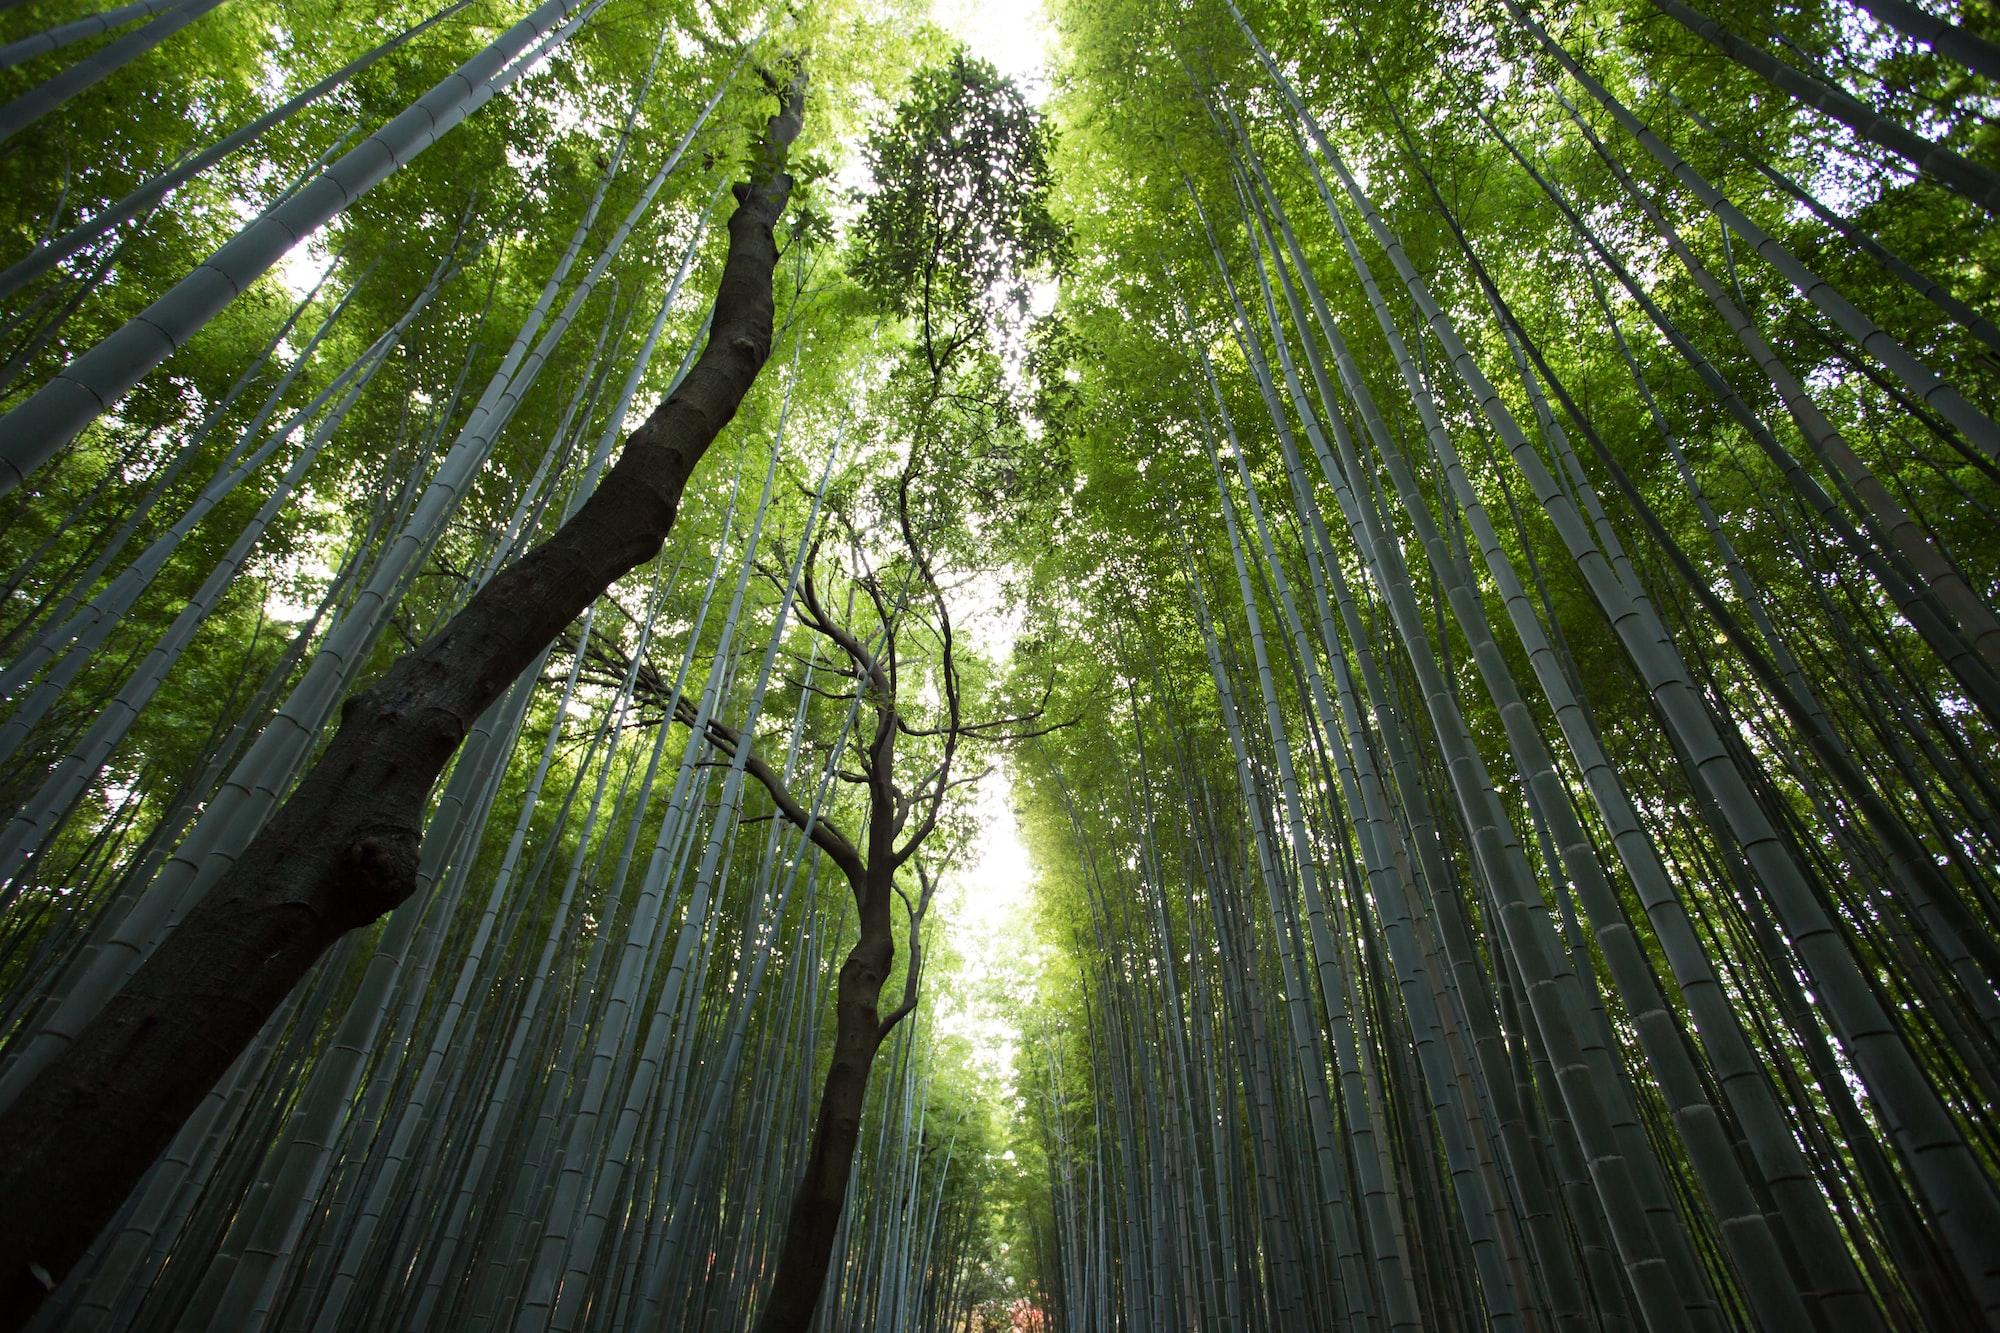 Impressive bamboo canopy